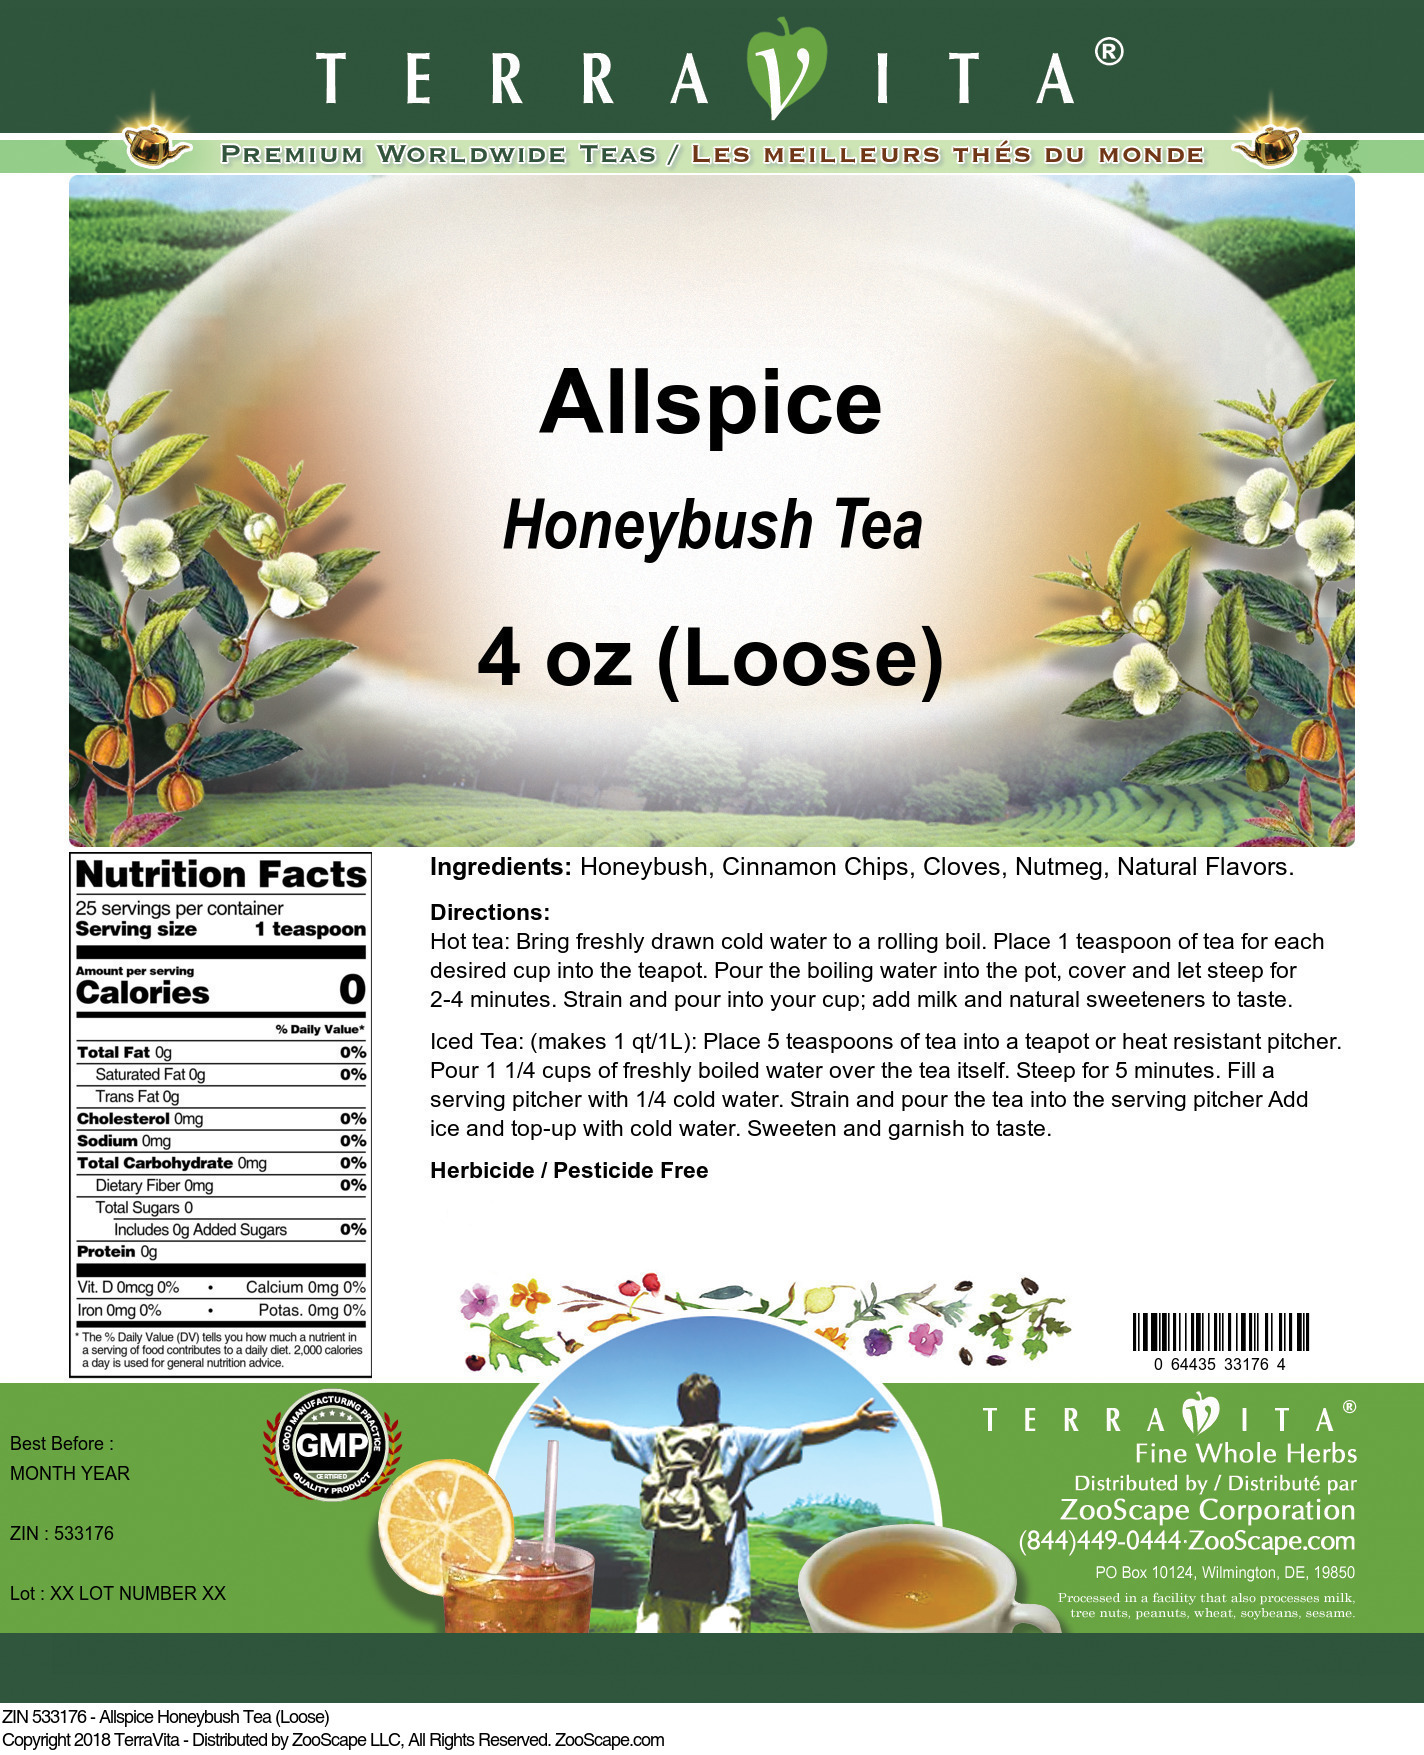 Allspice Honeybush Tea